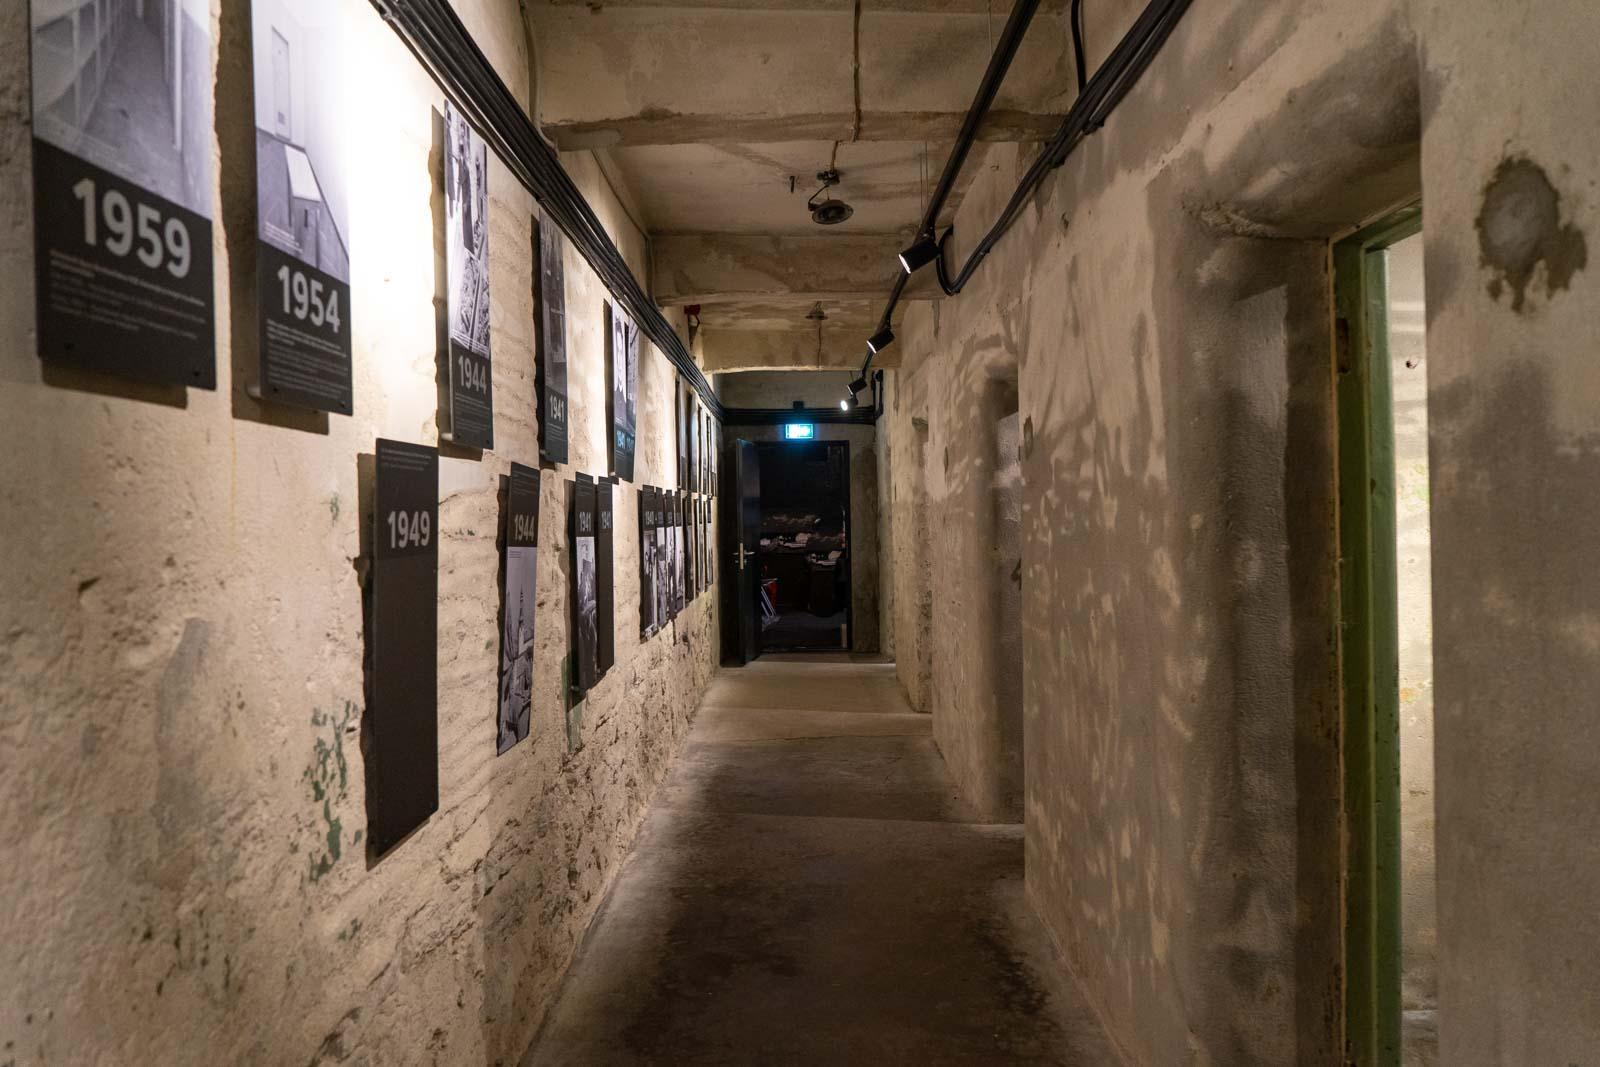 KGB Prison Cells, Tallinn, Estonia